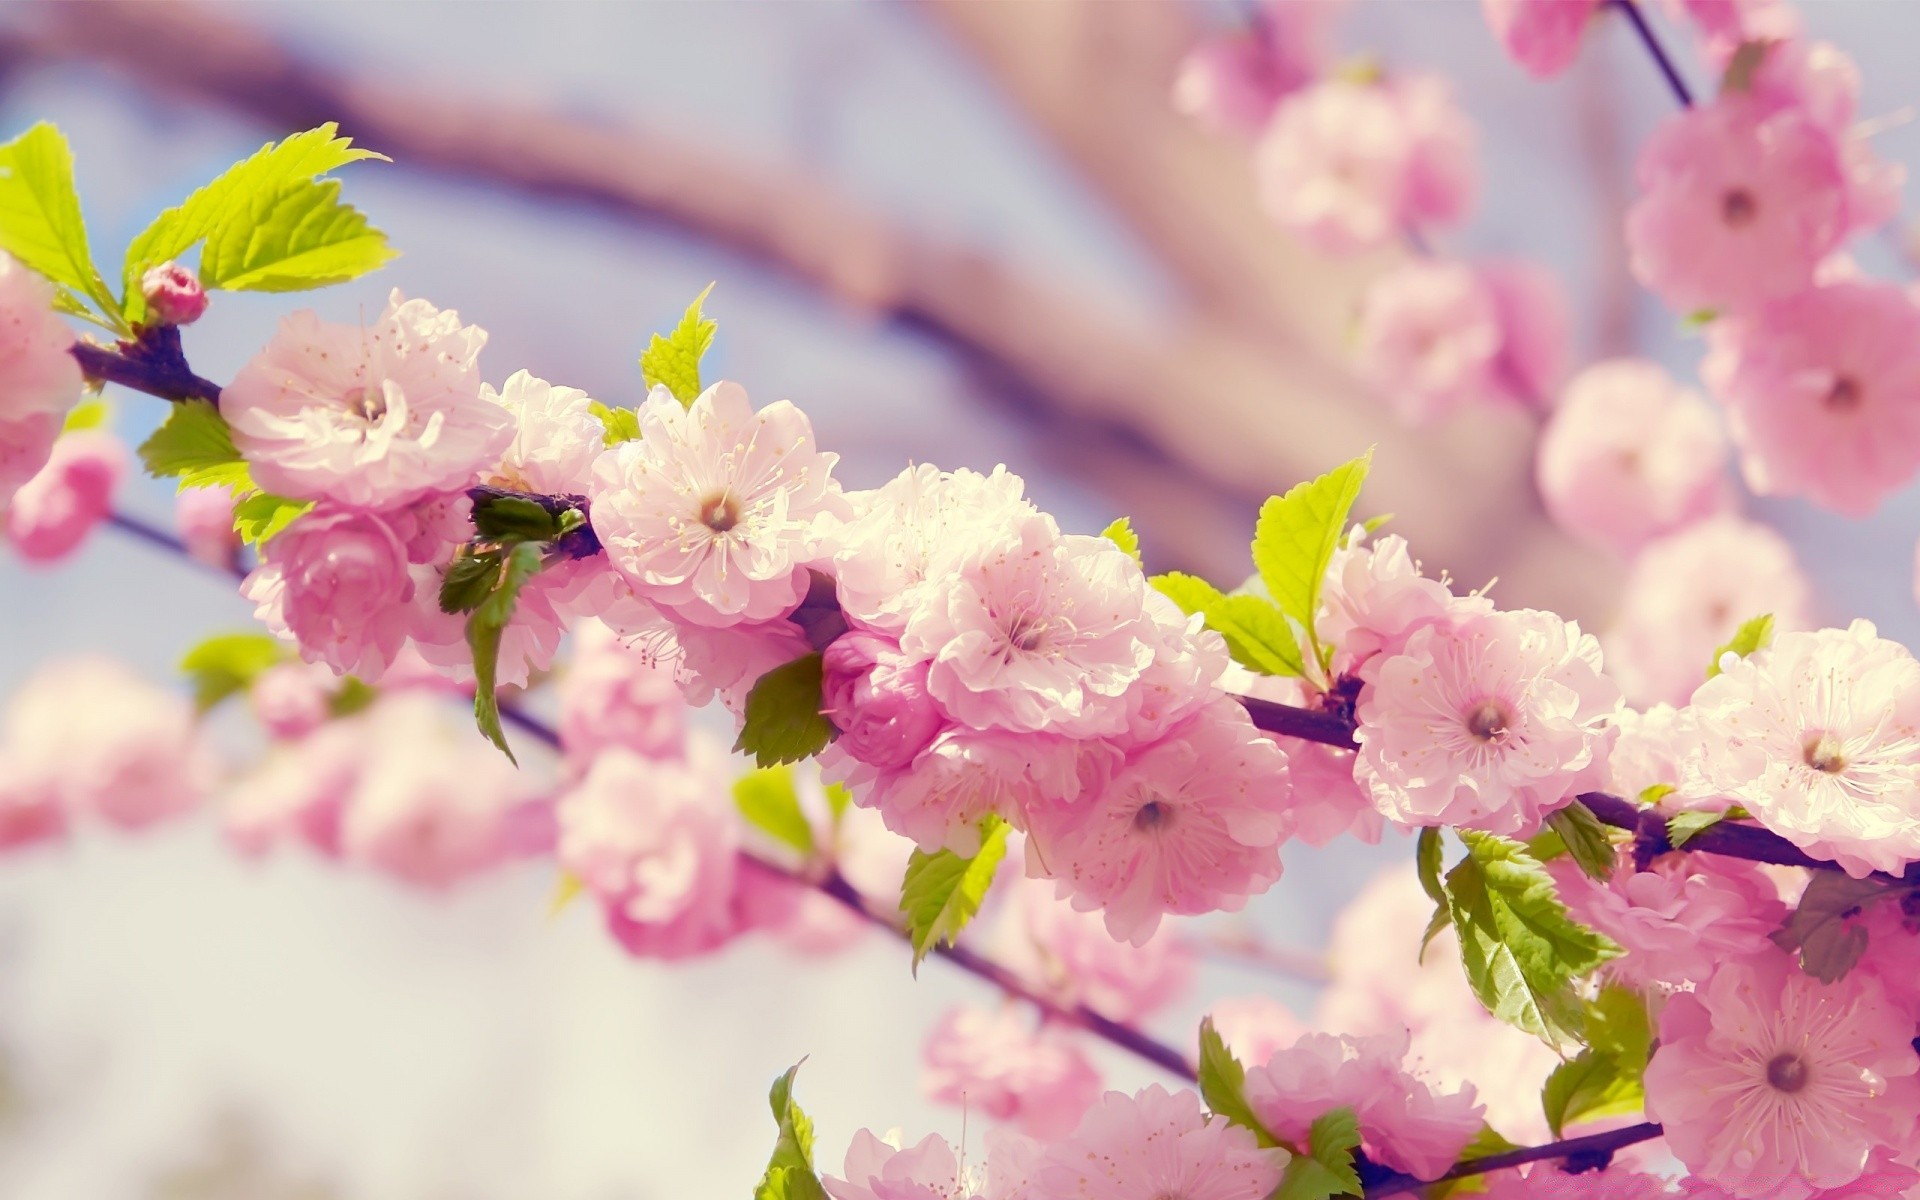 Картинки на рабочий стол большого формата весна